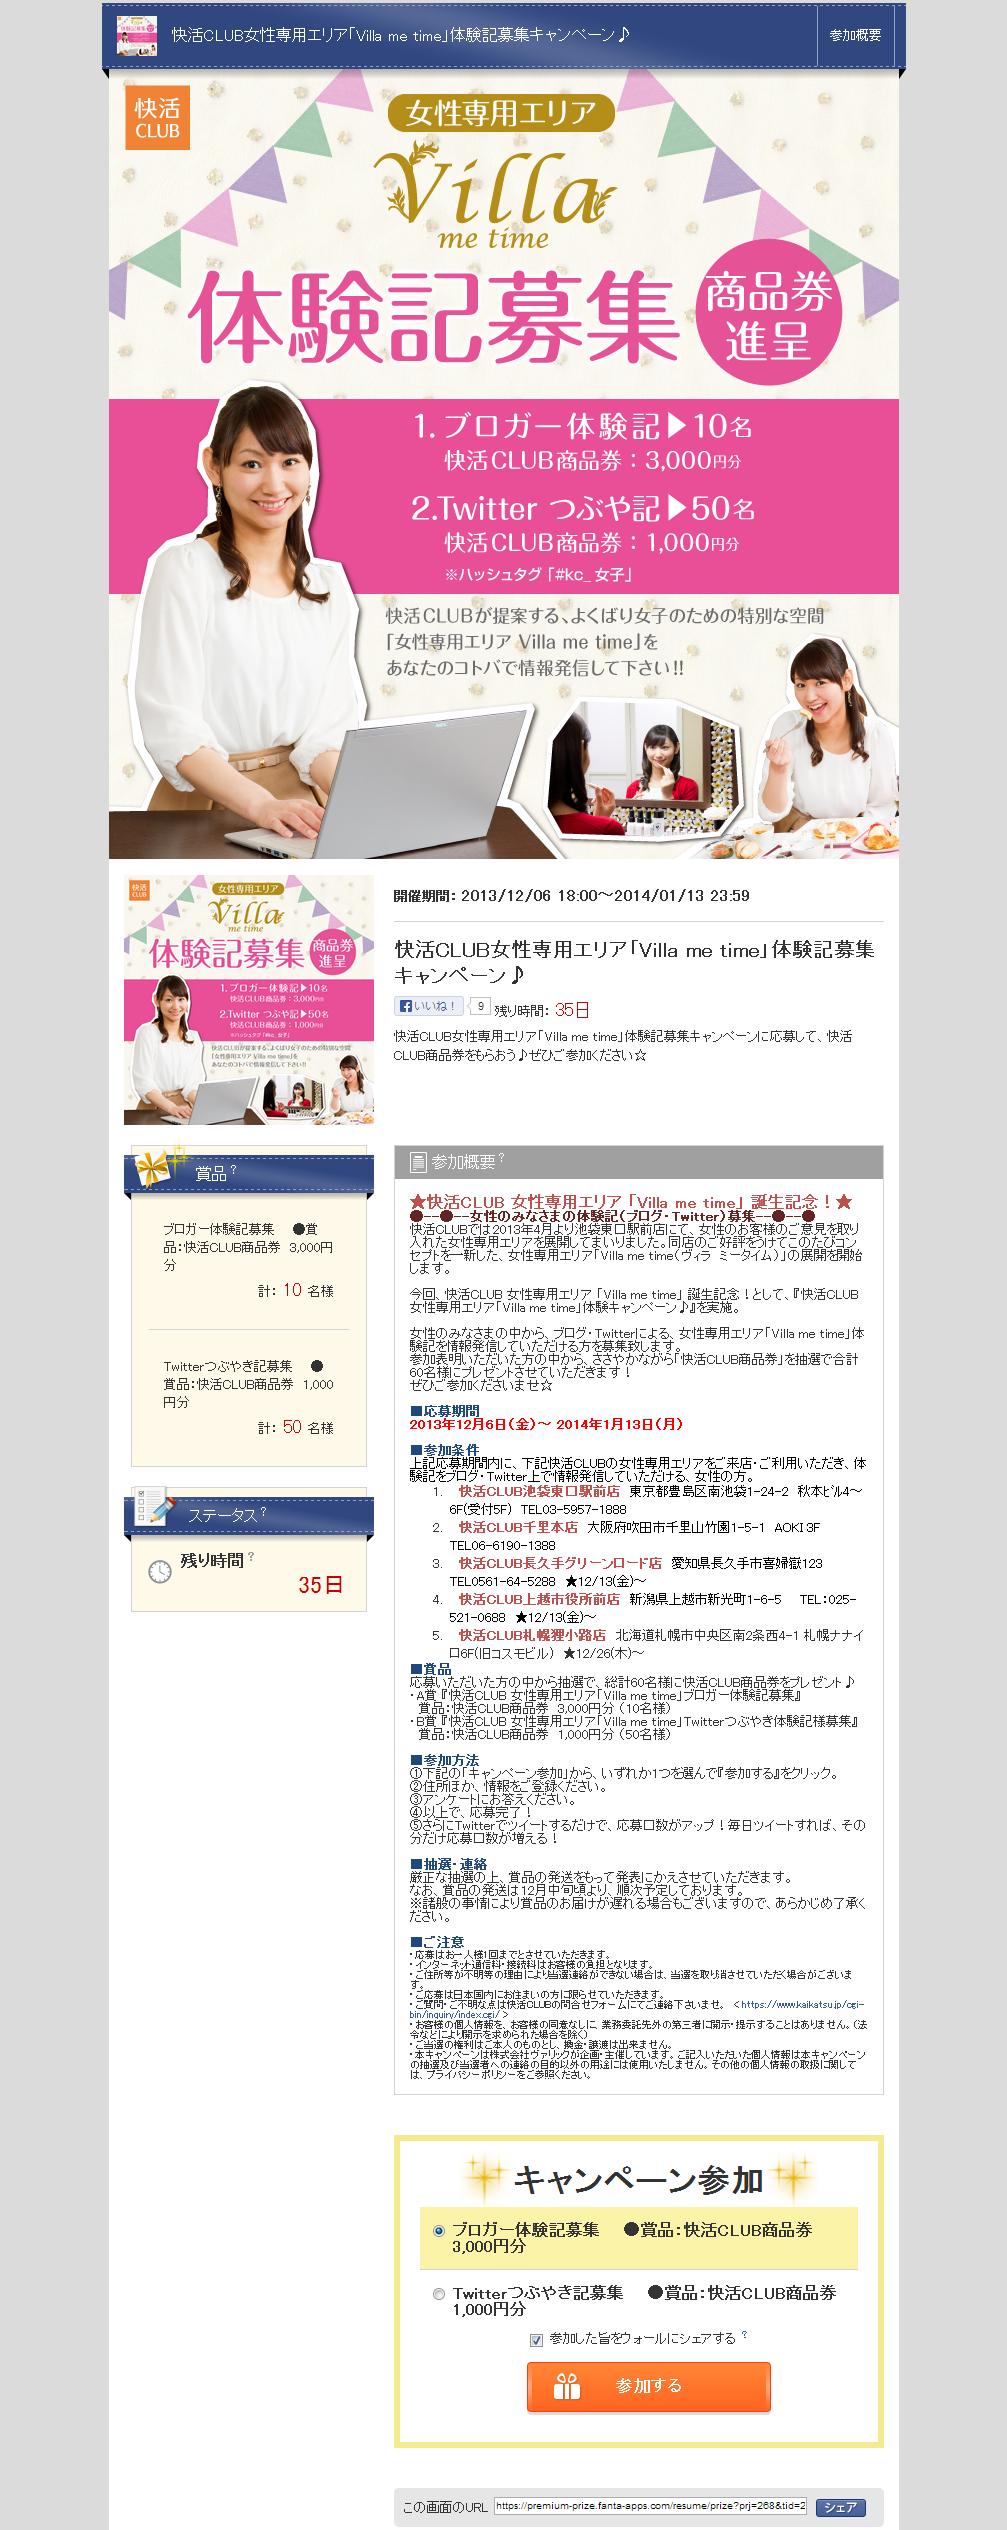 Fantastics 懸賞キャンペーンアプリ(株式会社ヴァリック様)